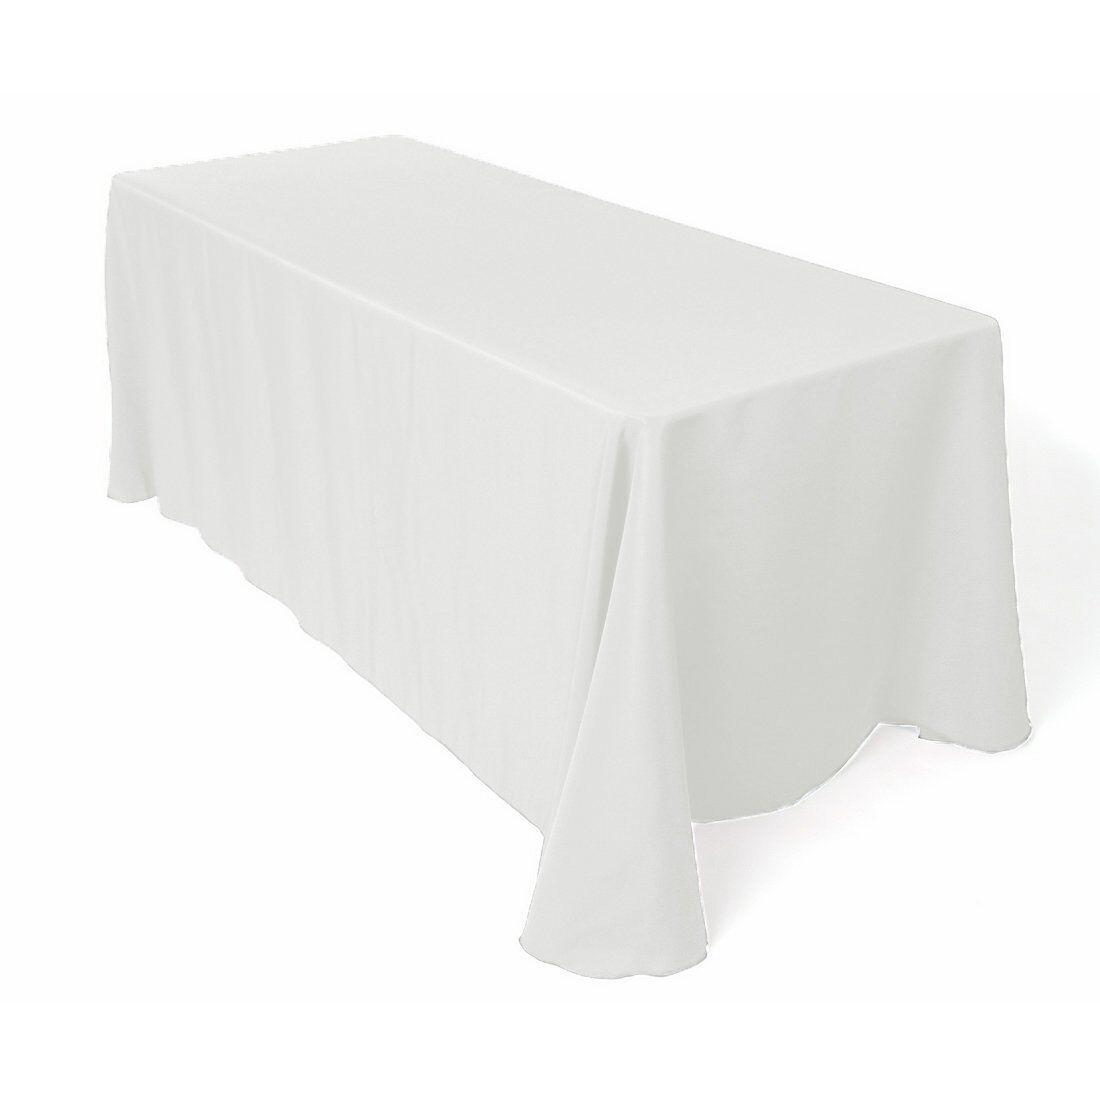 10 Pcs 60  x 102  blanc Rectangle Polyester Tablecloth Bulk for Weddings Party